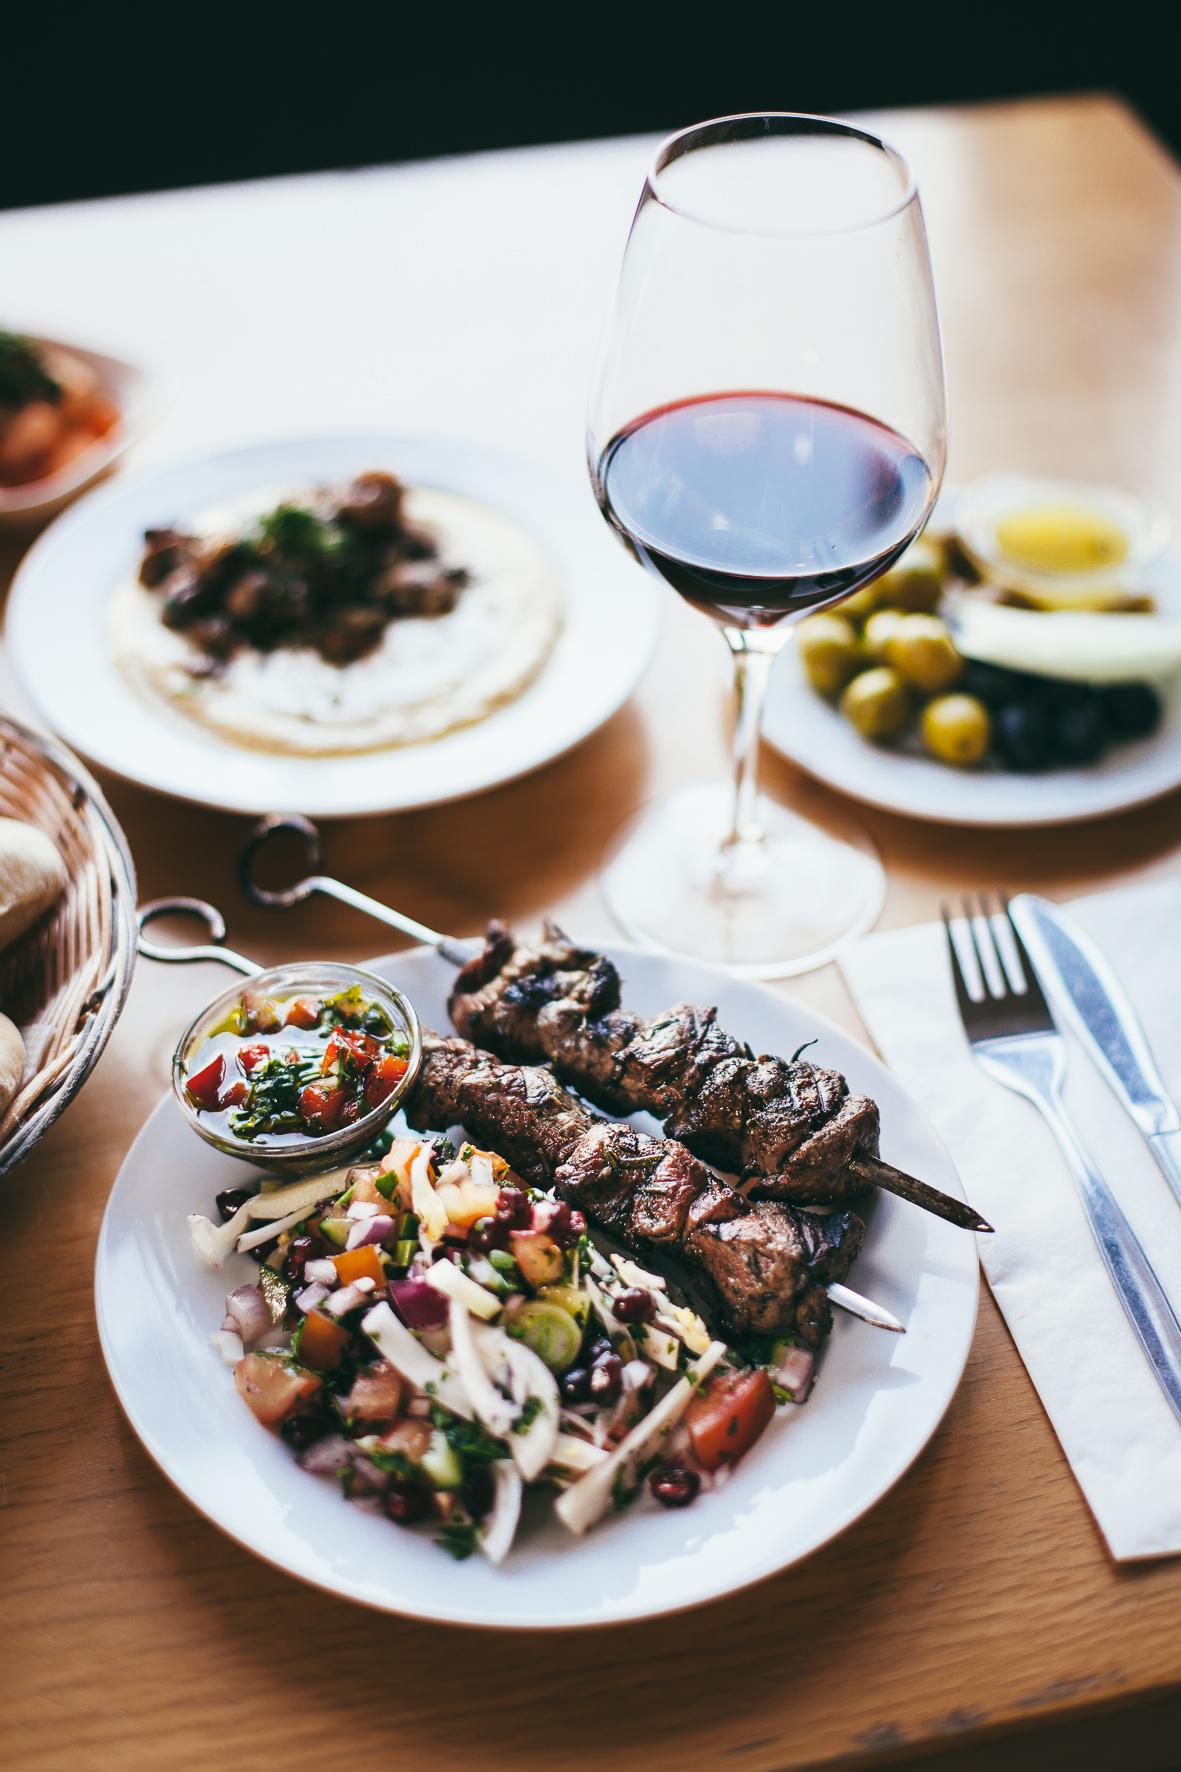 djimalaya restaurant berlin | read-the-trieb